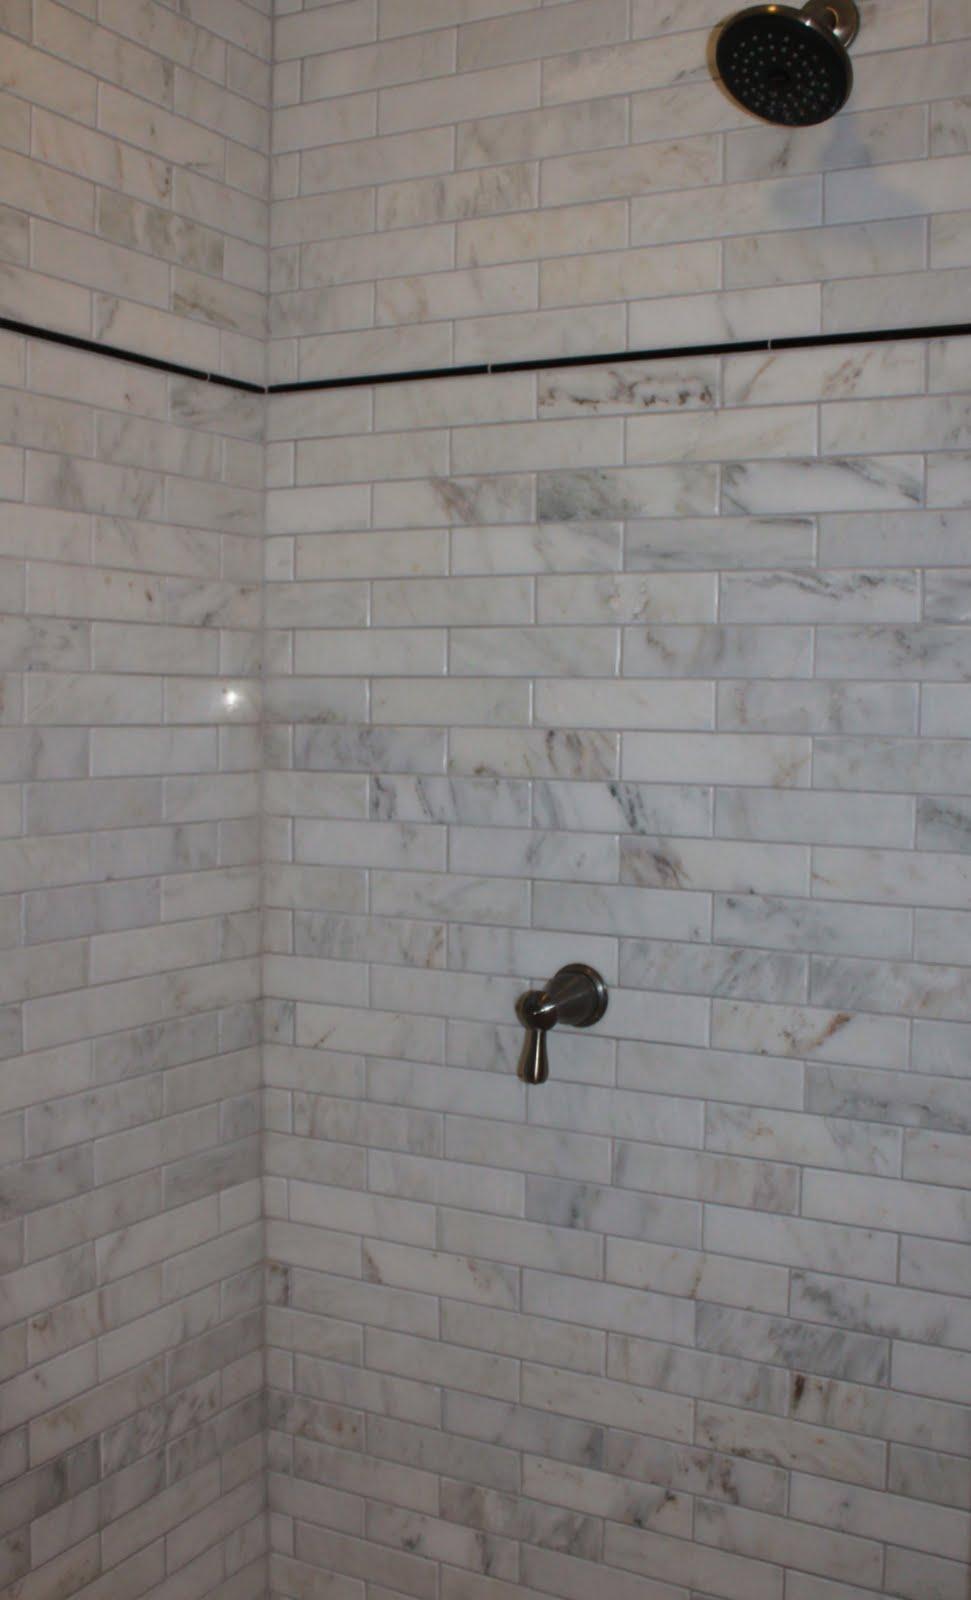 Marble Subway Tile Shower Offering the Sense of Elegance ... on Bathroom Ideas Subway Tile  id=48518